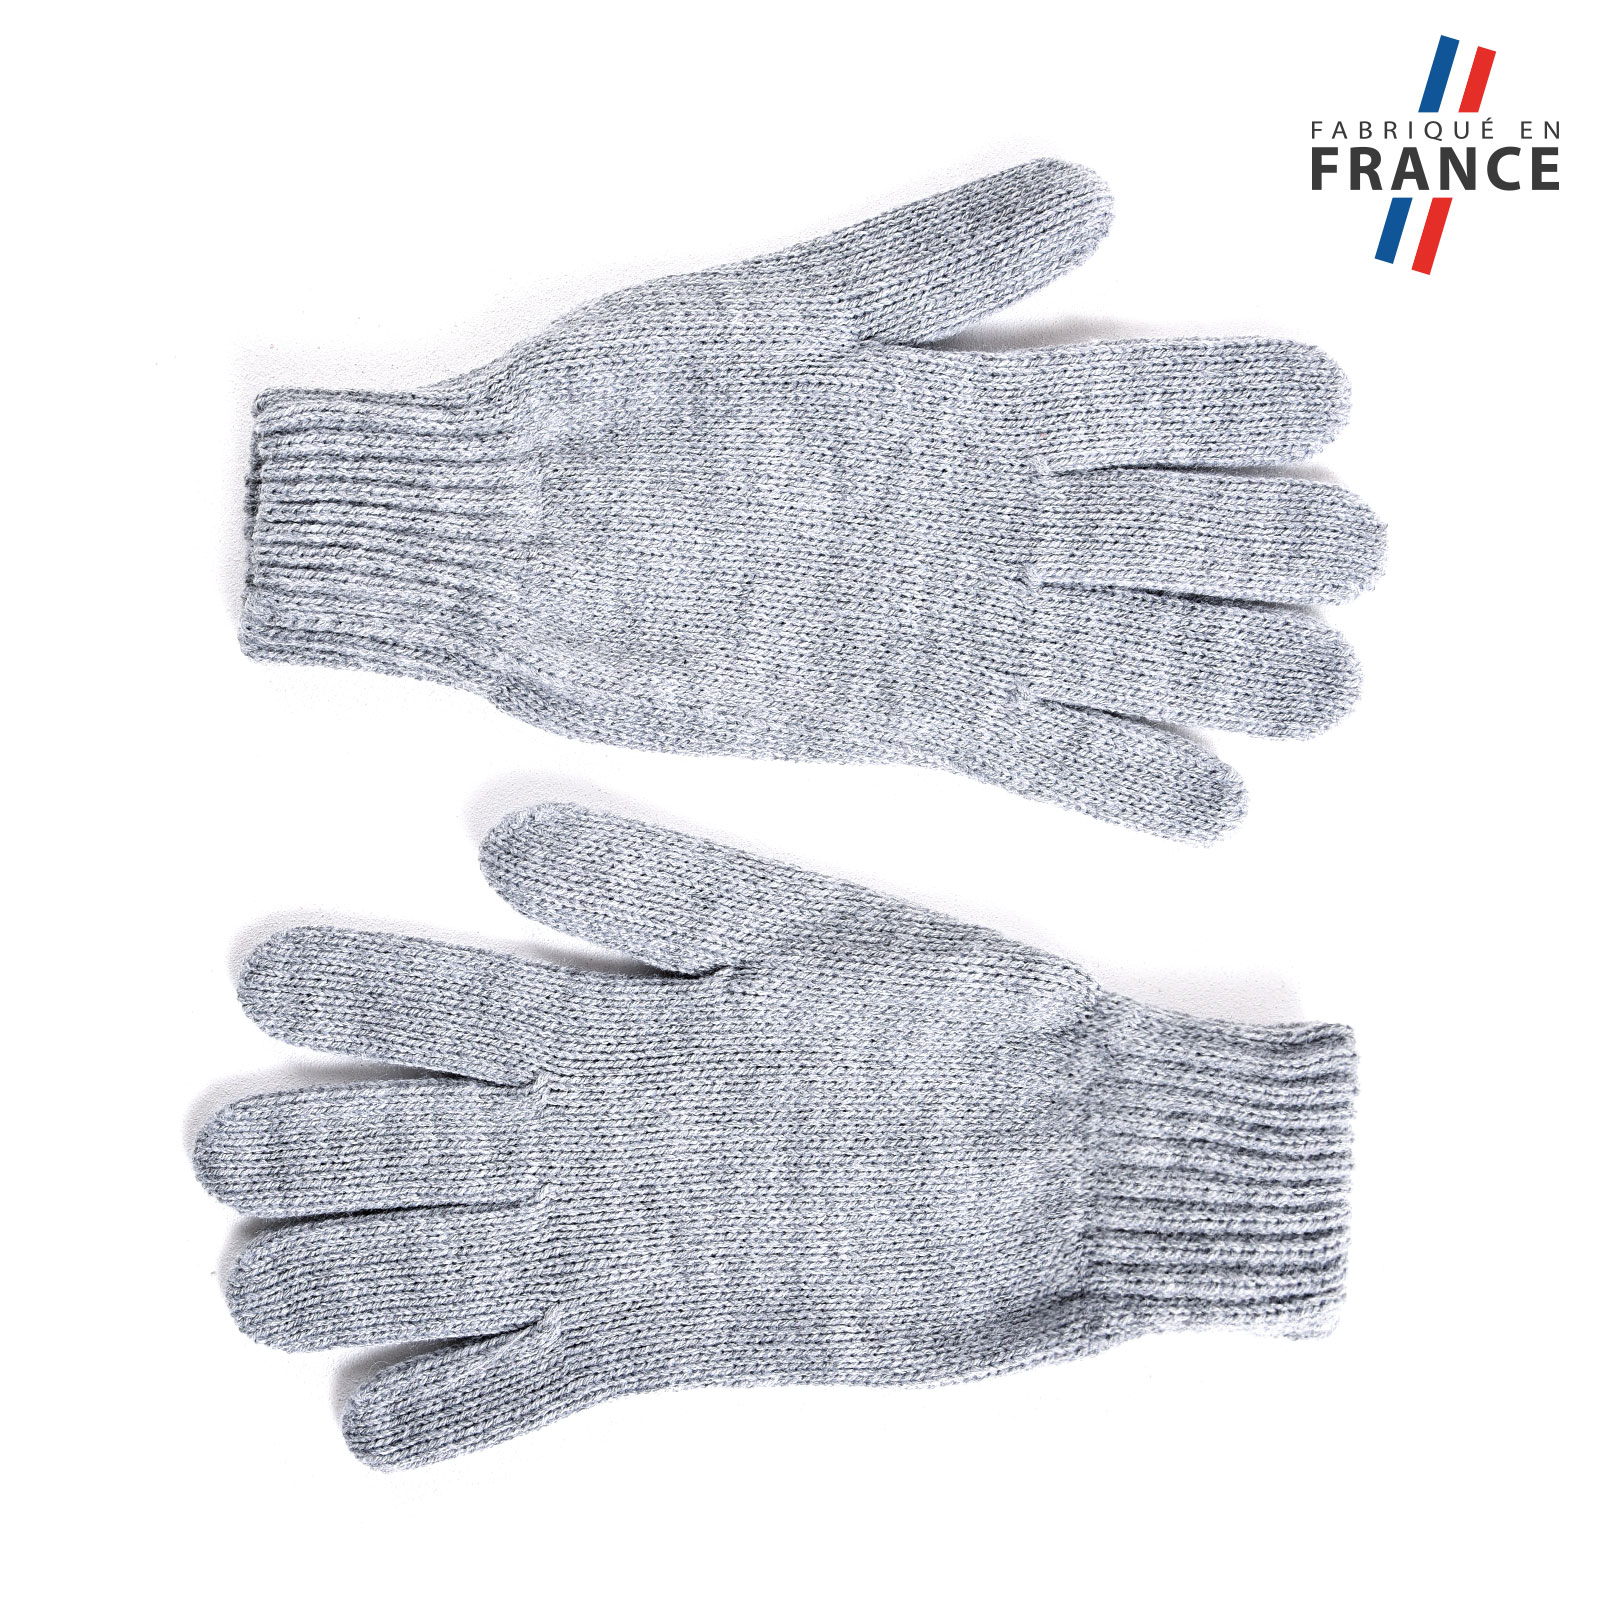 GA-00008-A16-LB_FR-gants-femme-gris-fabrication-france